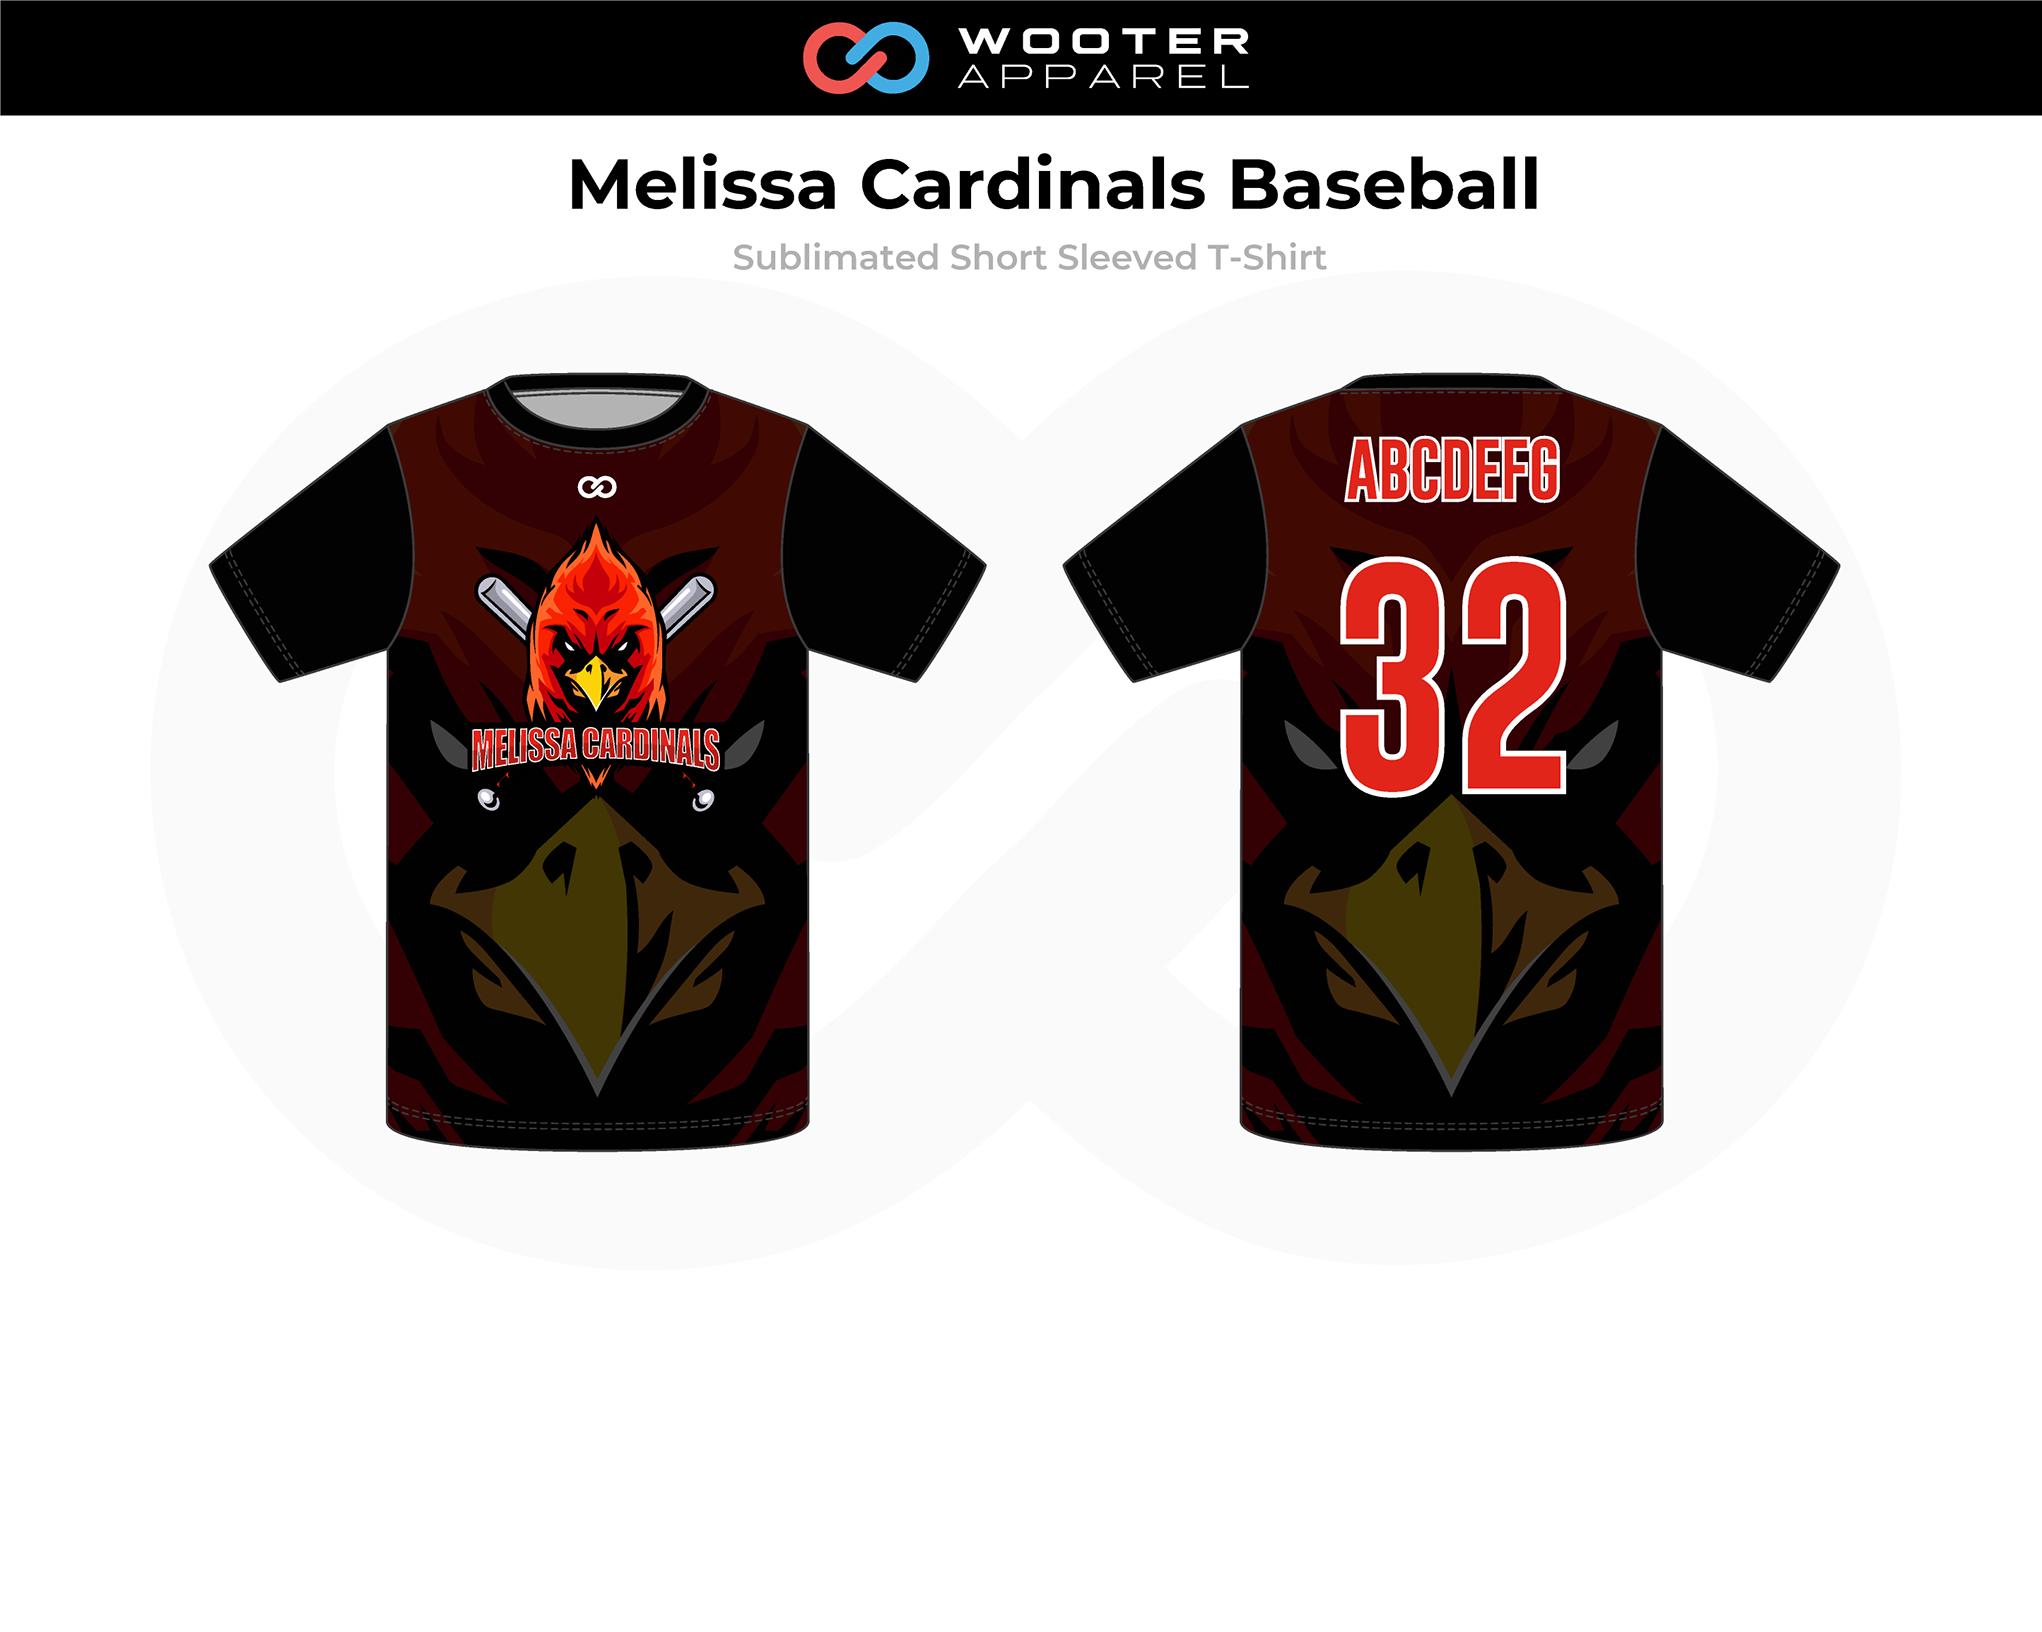 MELISSA CARDINALS Red Brown Black Yellow Sublimated Short Sleeved Baseball T-Shirt